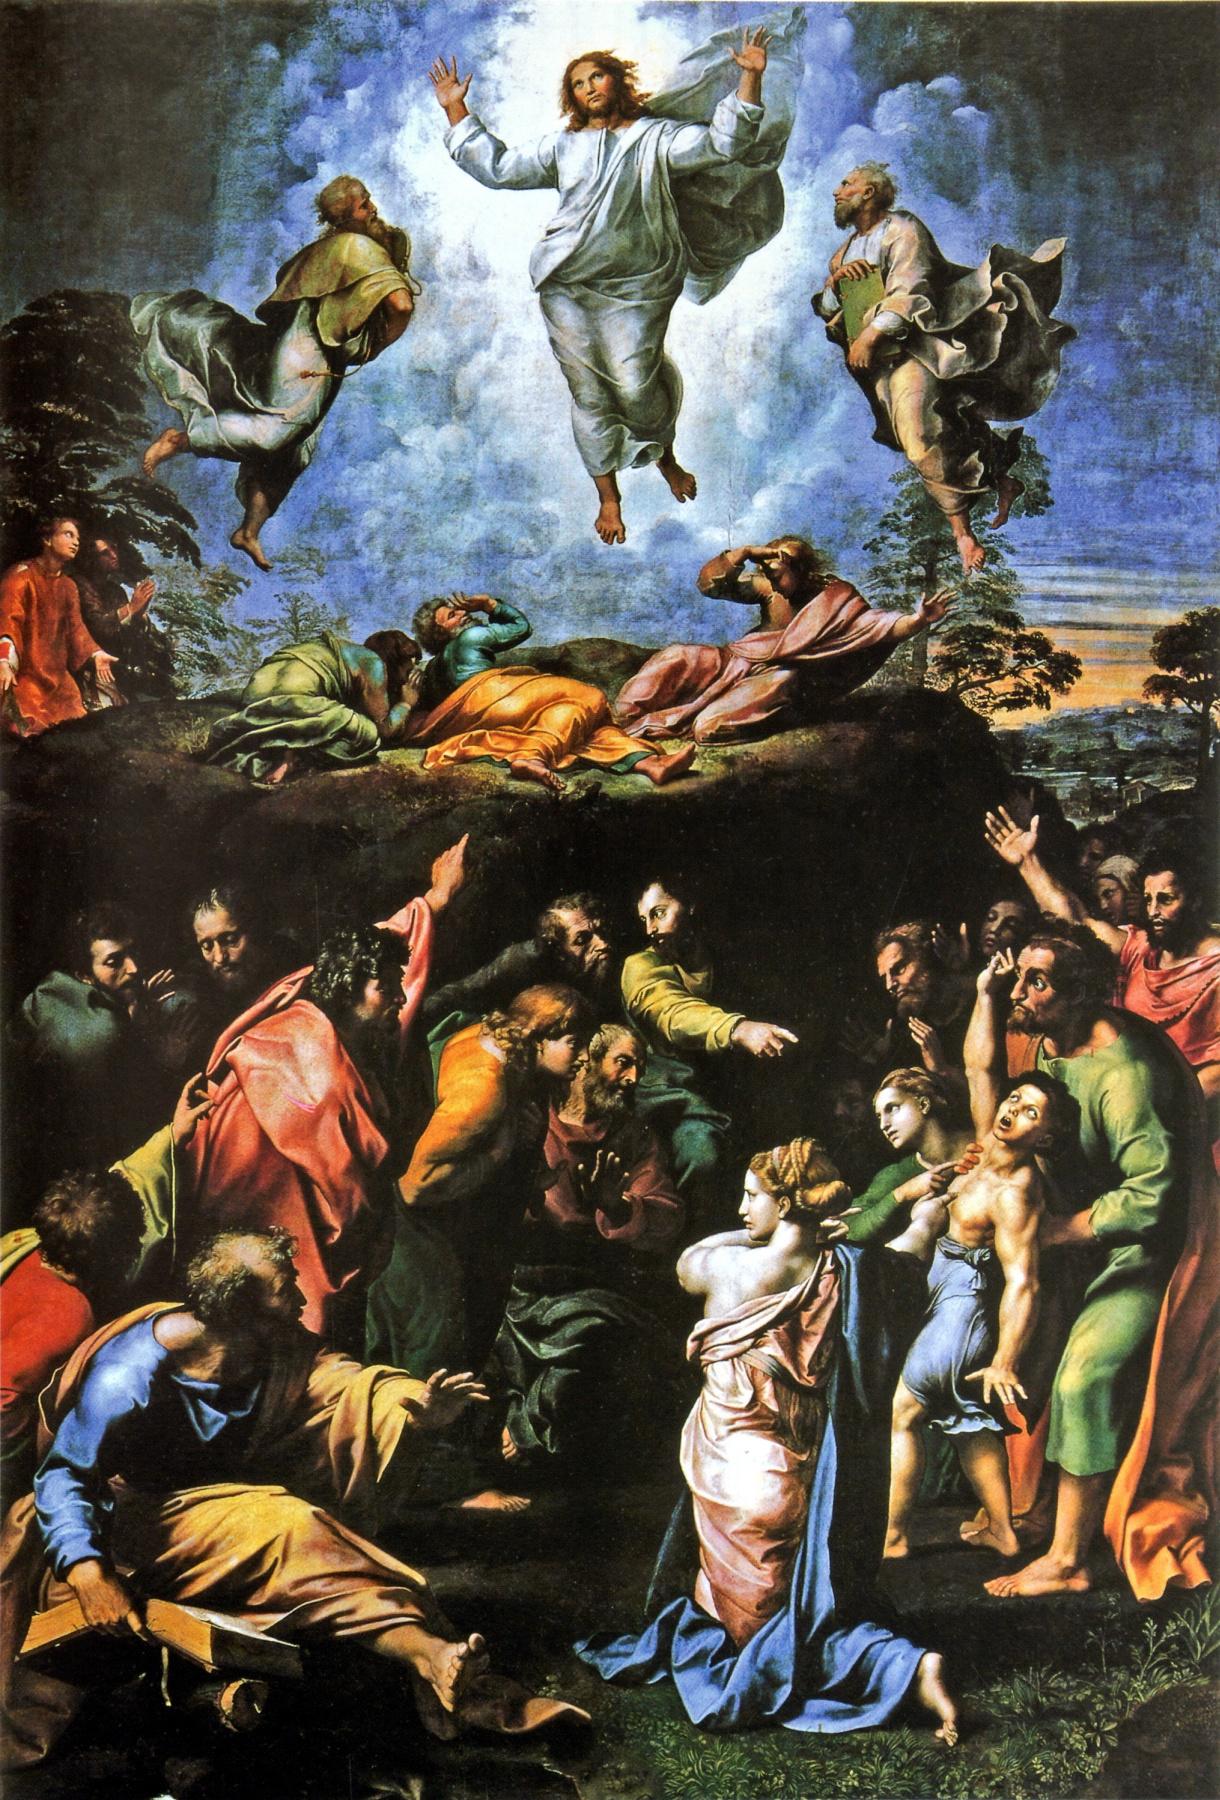 Raphael Sanzio. Transformation